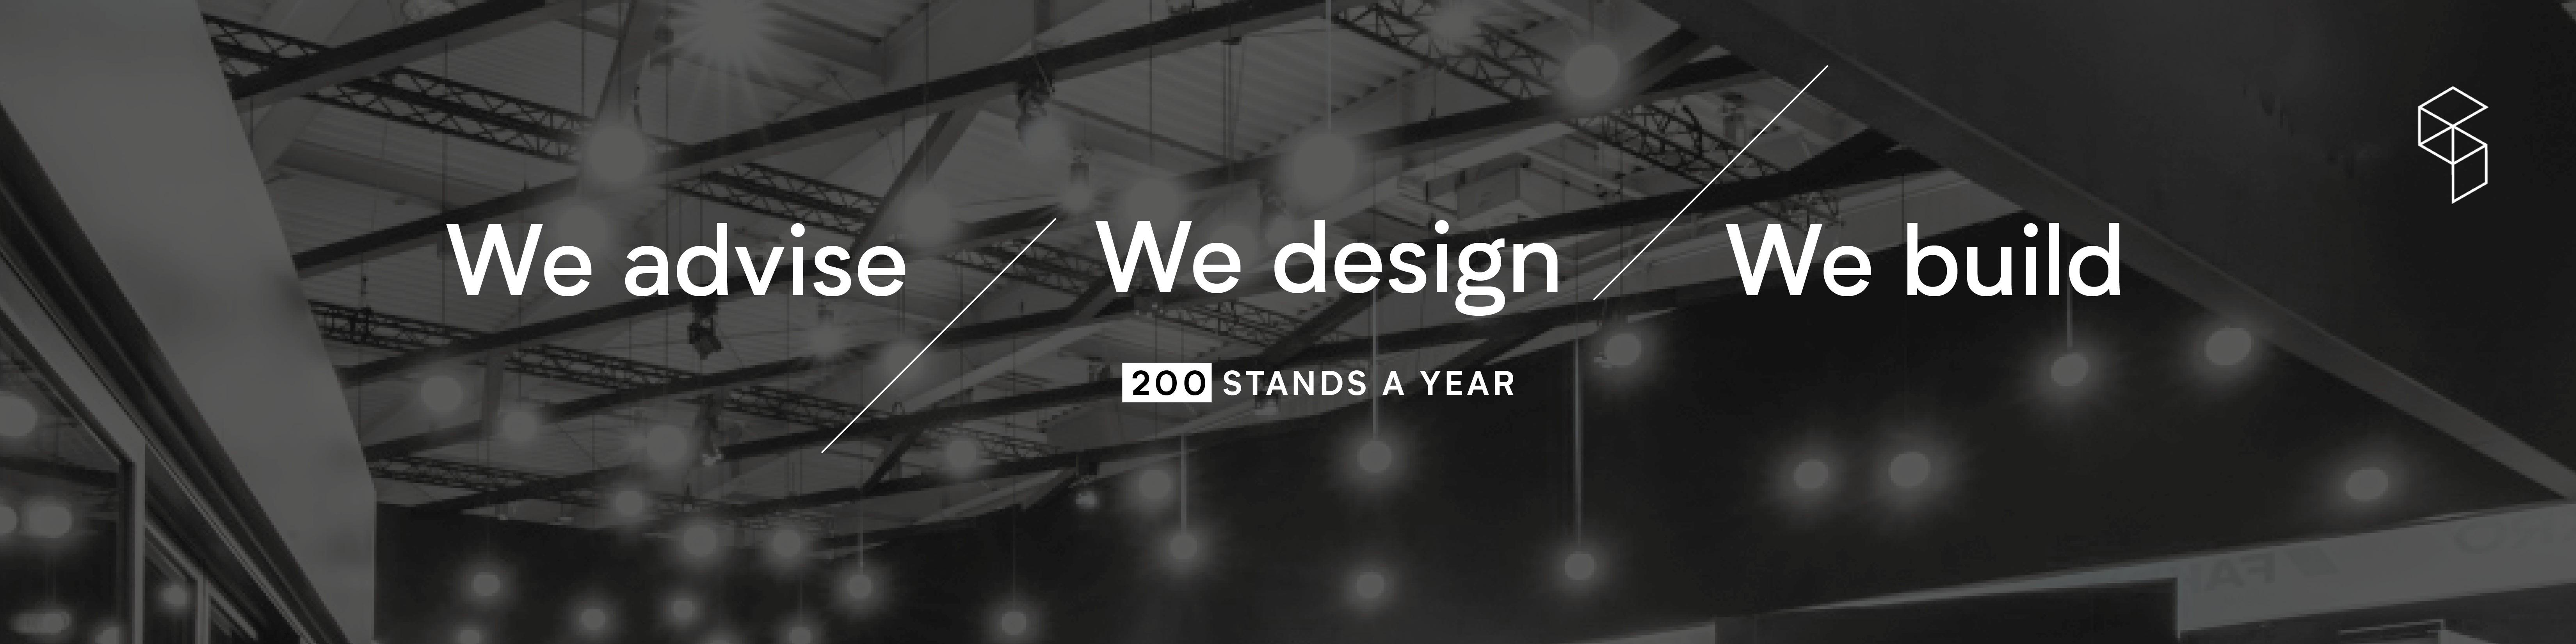 Photography Expo Stands : Smart design expo sp. z o.o. linkedin